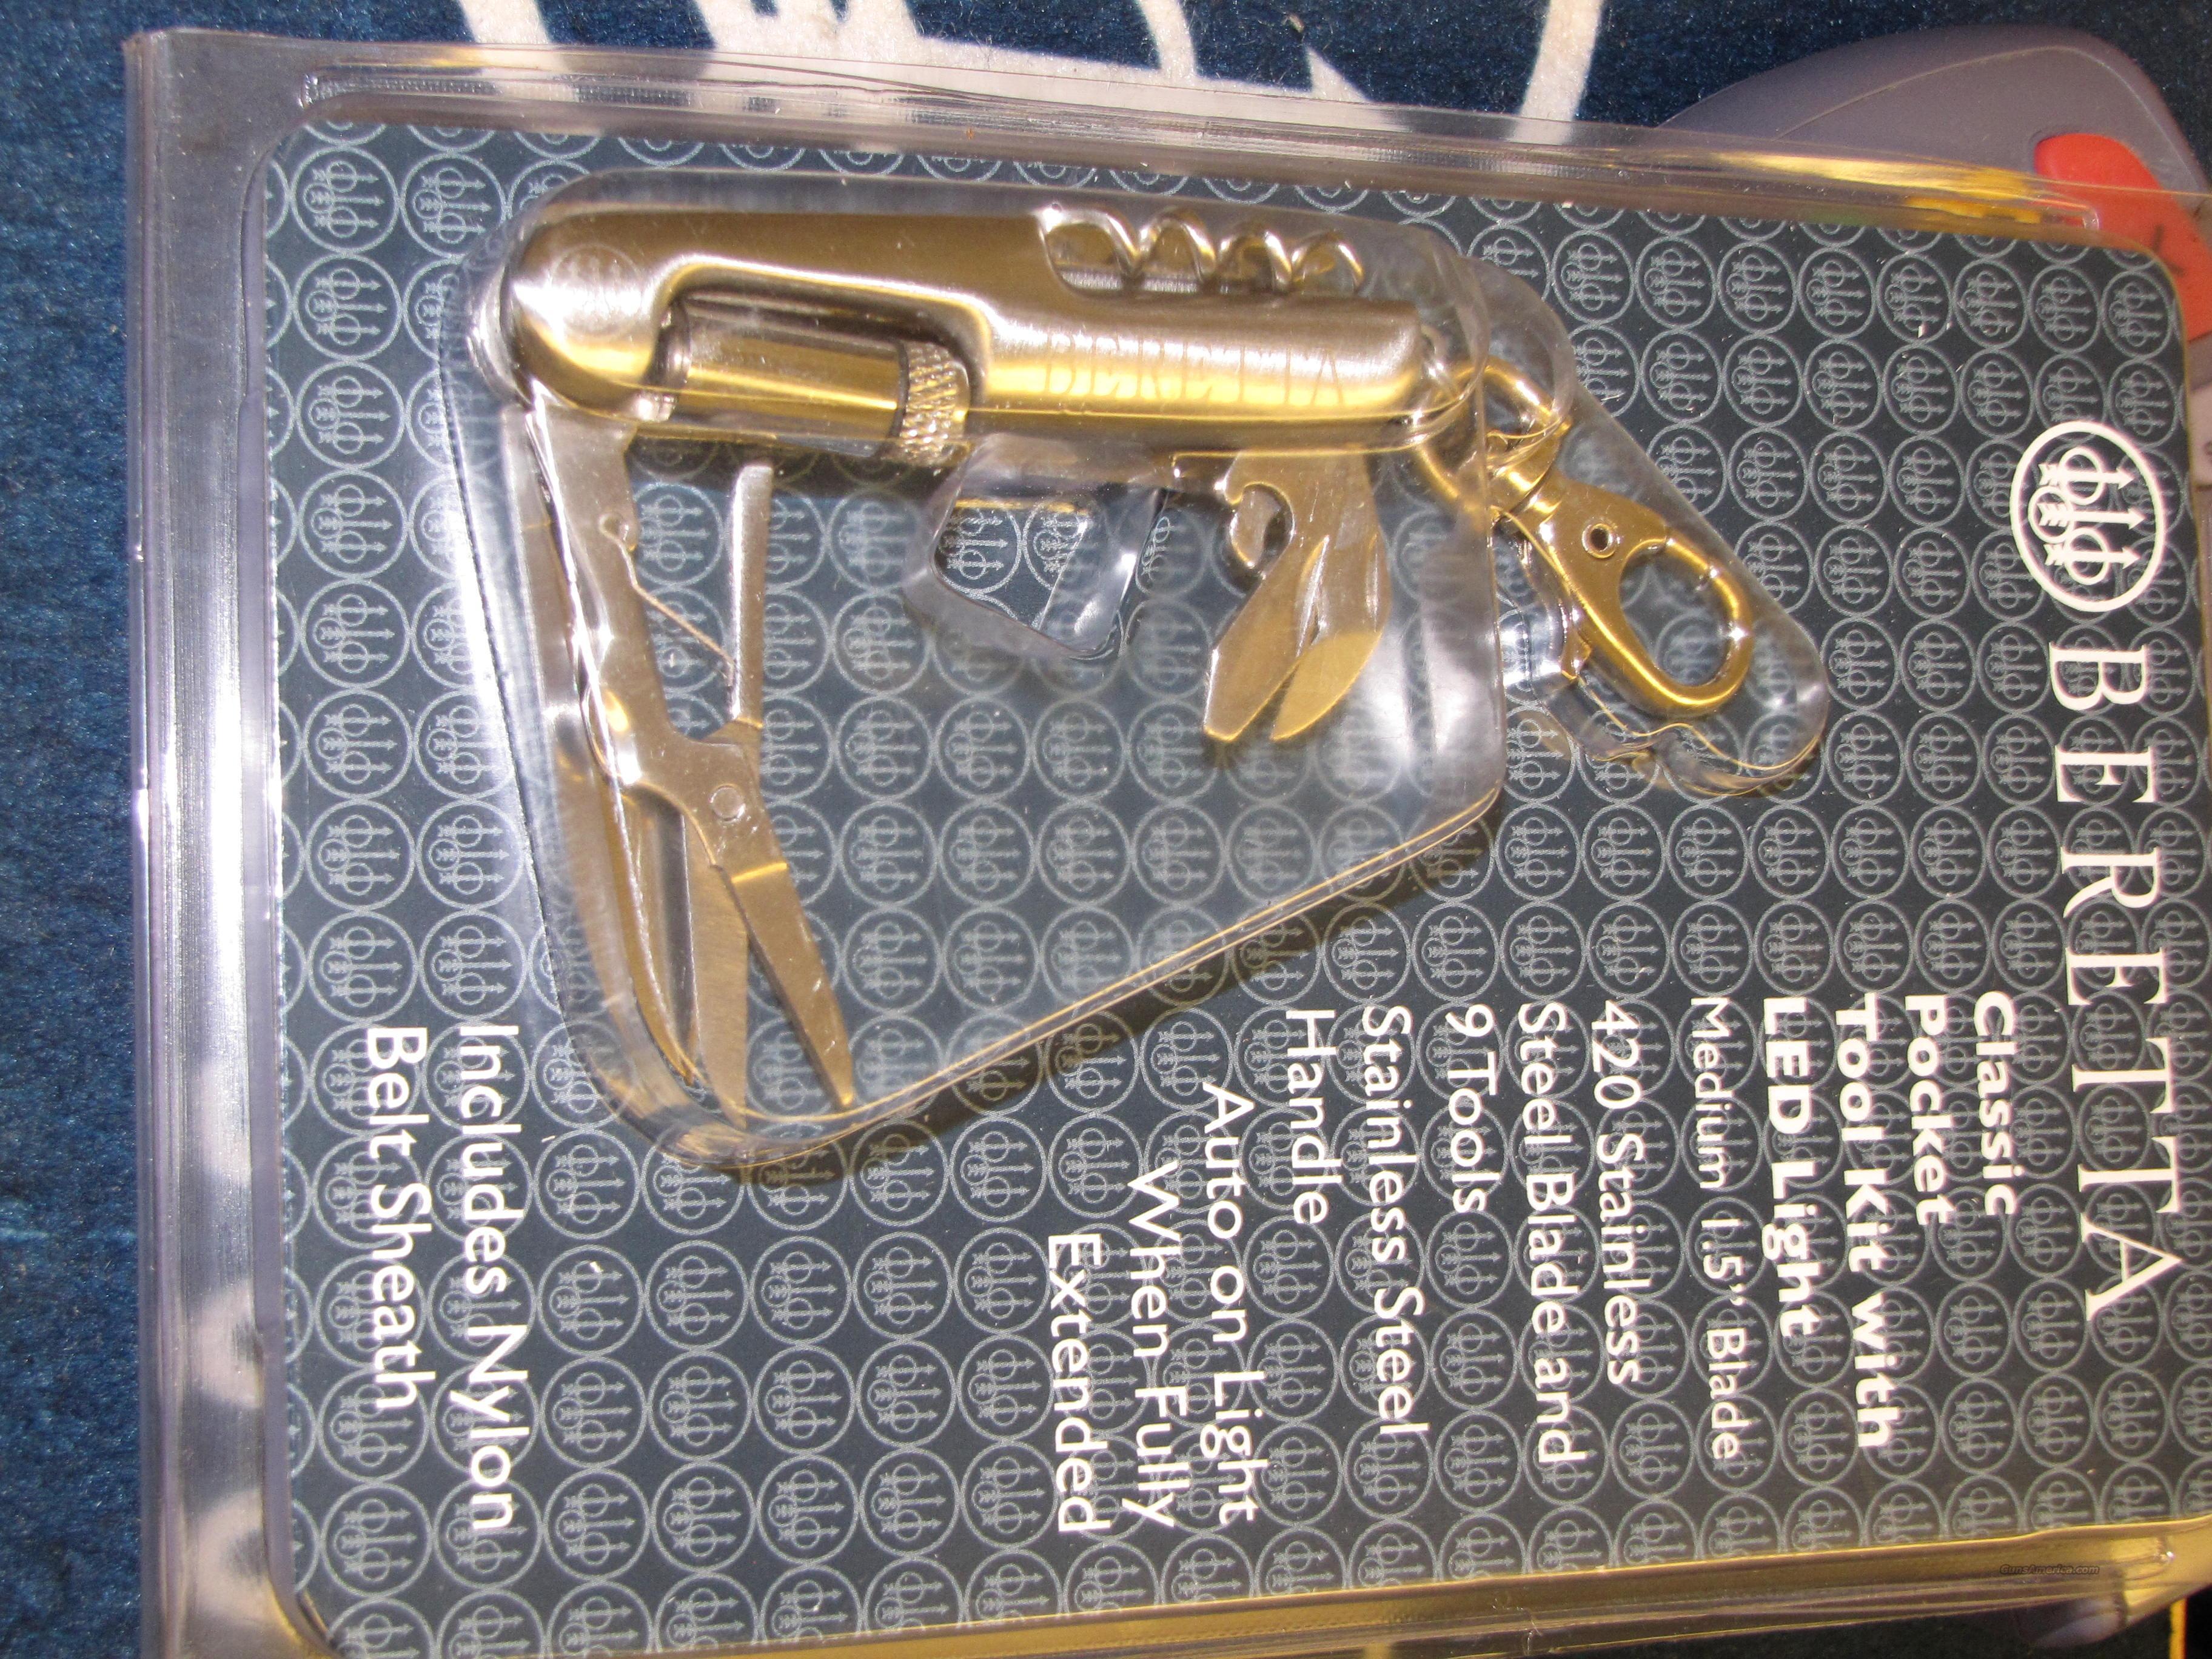 Beretta Multi tool  Non-Guns > Miscellaneous